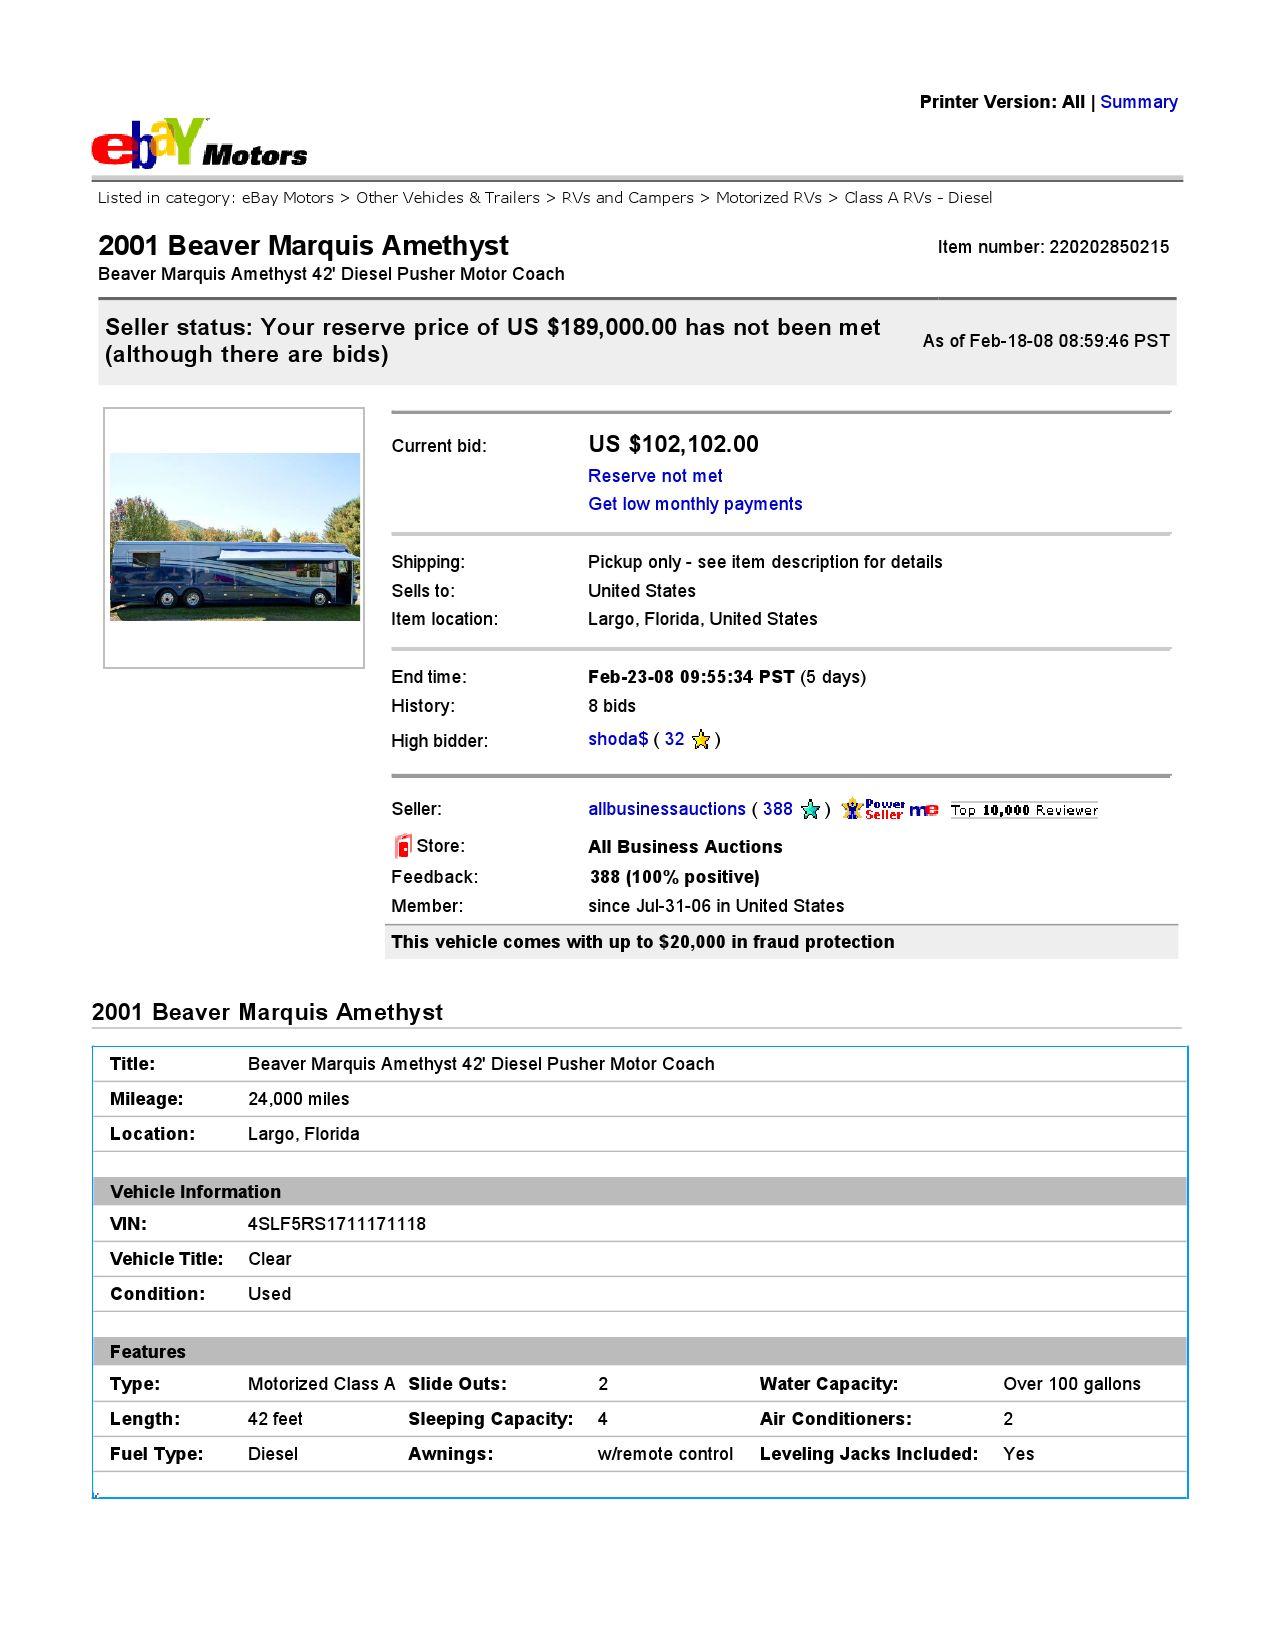 Ebay Motors Beaver Marquis Amethyst 42 Diesel Pusher Motor Coach Item 220202850215 End Time Feb 2 By Ibusinesslogic Corporation Issuu